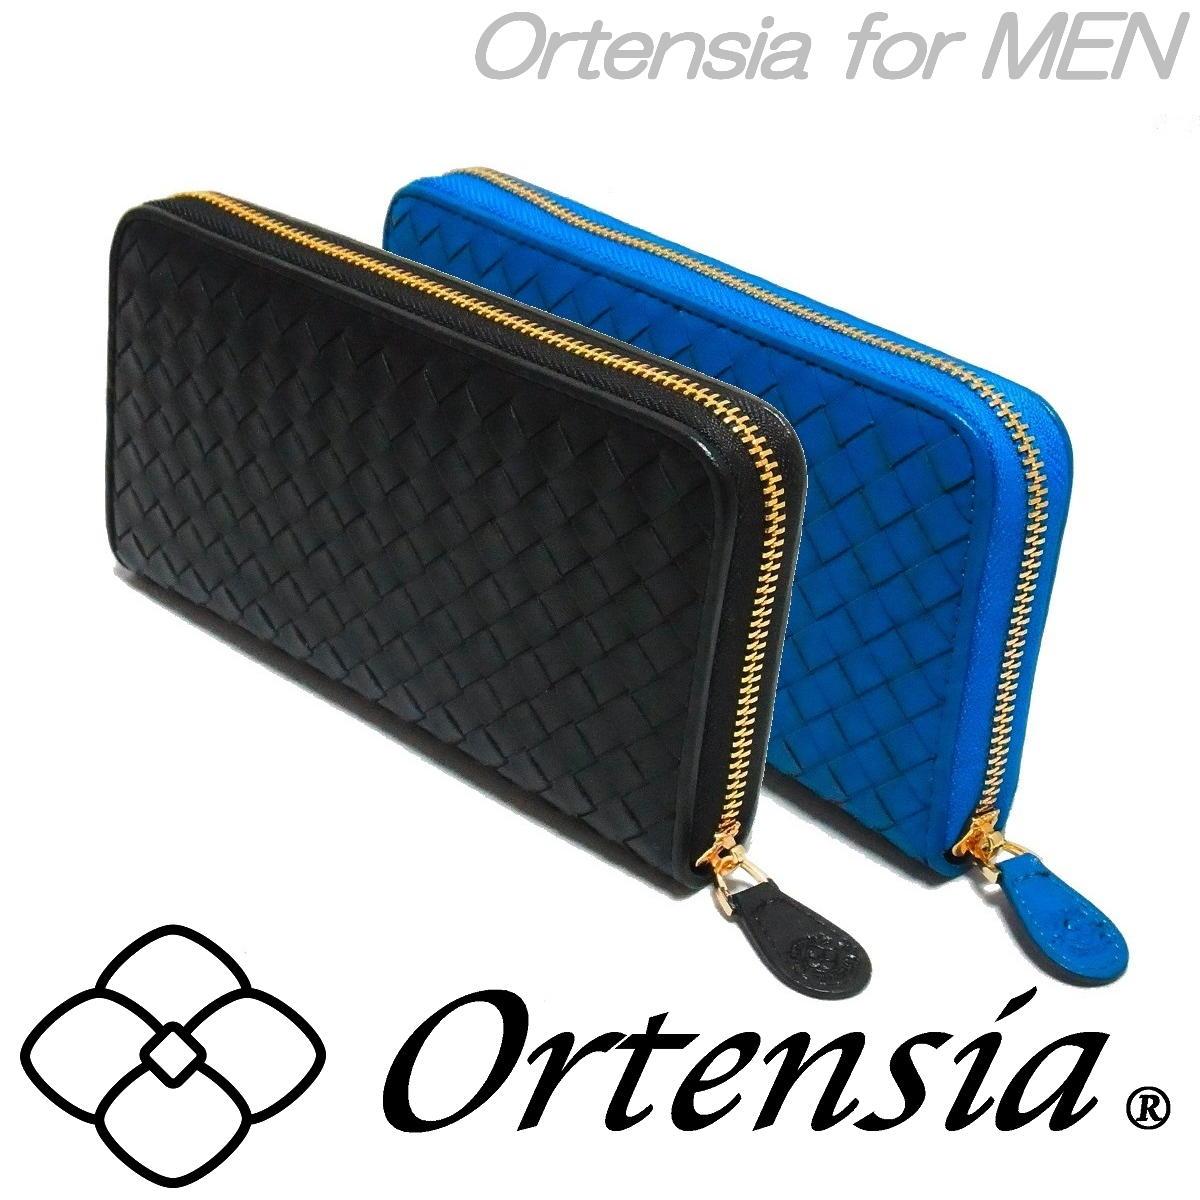 Ortensia(オルテンシア)イタリアンレザー メッシュ イントレチャート ラウンドファスナー 長財布 さいふ(本革・メンズ)ブラック・ネイビー